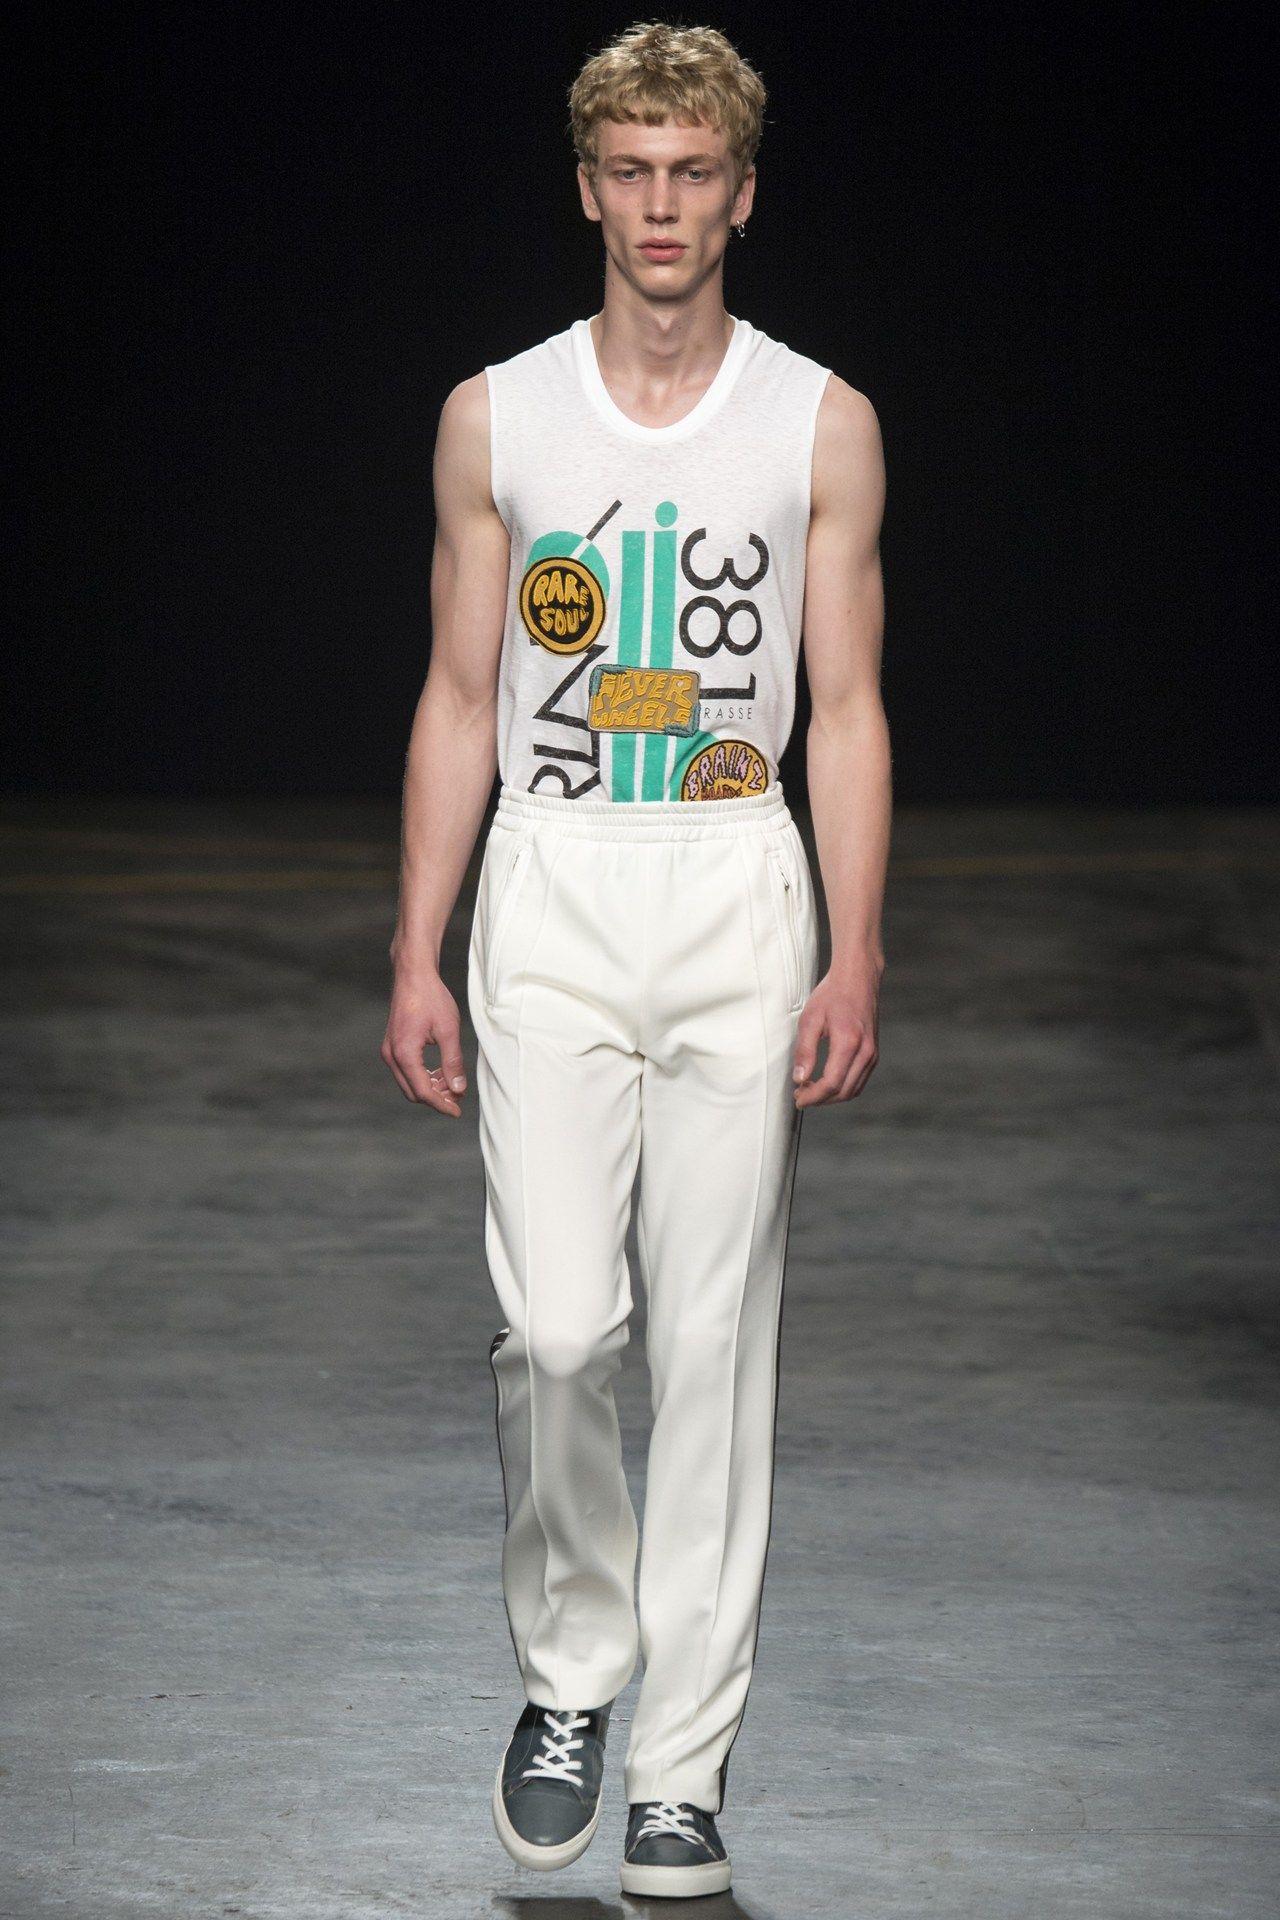 Topman design springsummer collection